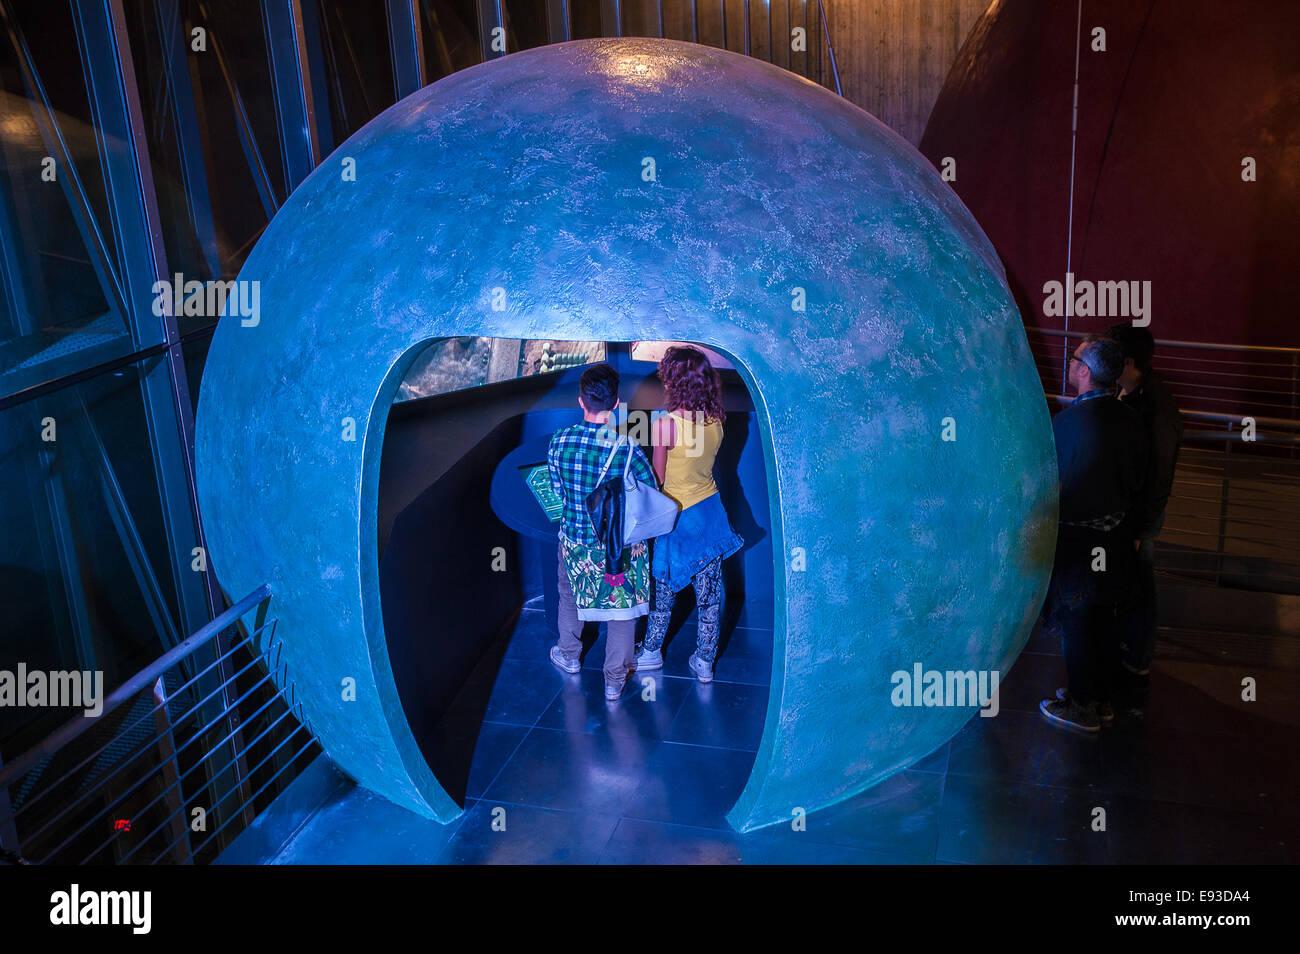 Italy Piedmont Turin Pino Torinese Inauguration of the new museum area of the Turin Museum Planetarium Astronomy - Stock Image